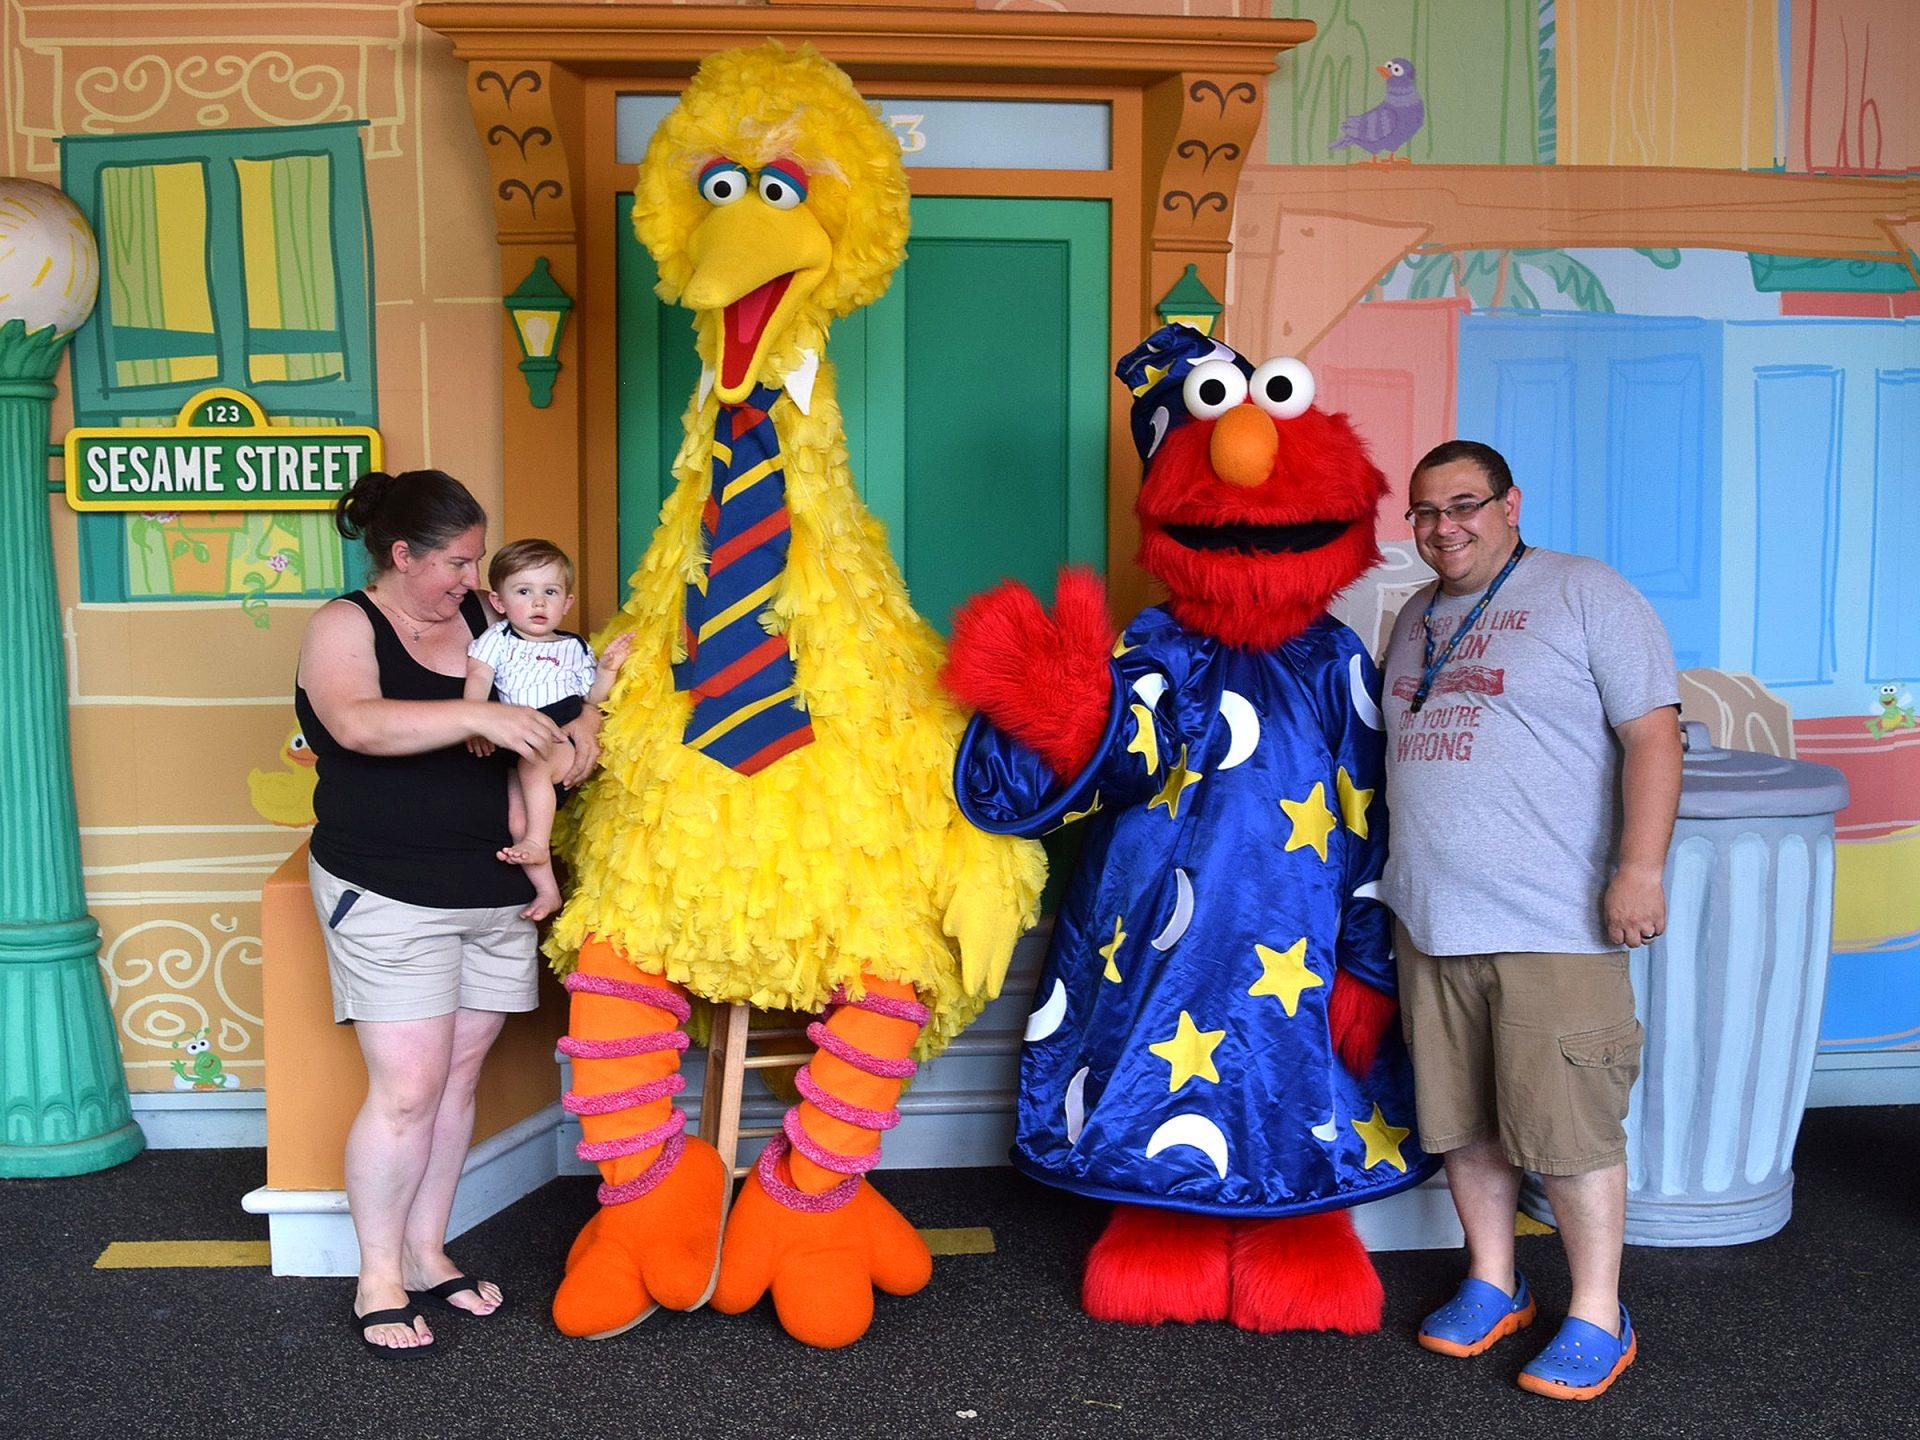 Sesame place visit